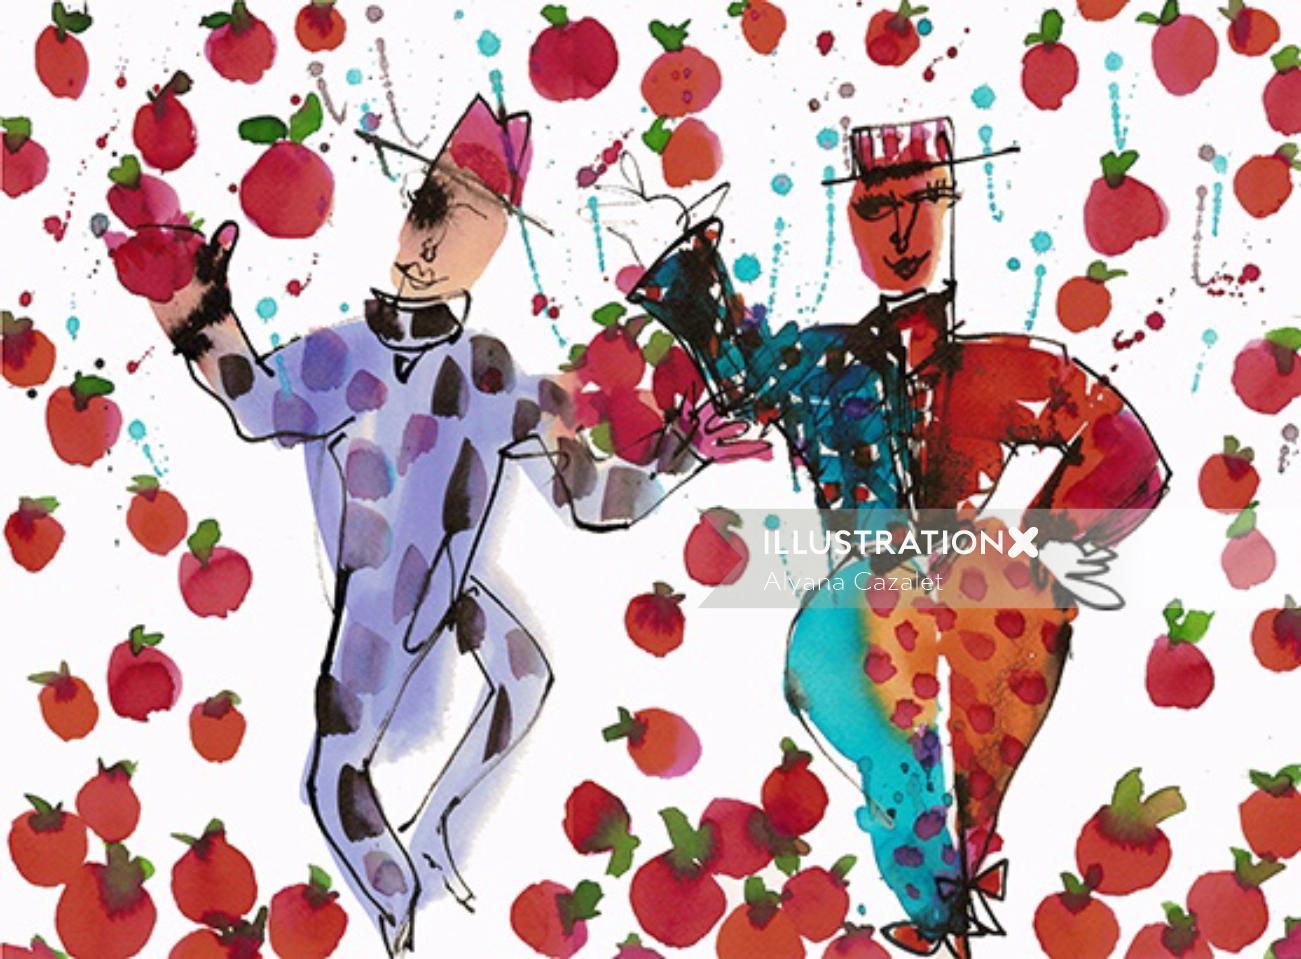 Illustration of Dancing clowns